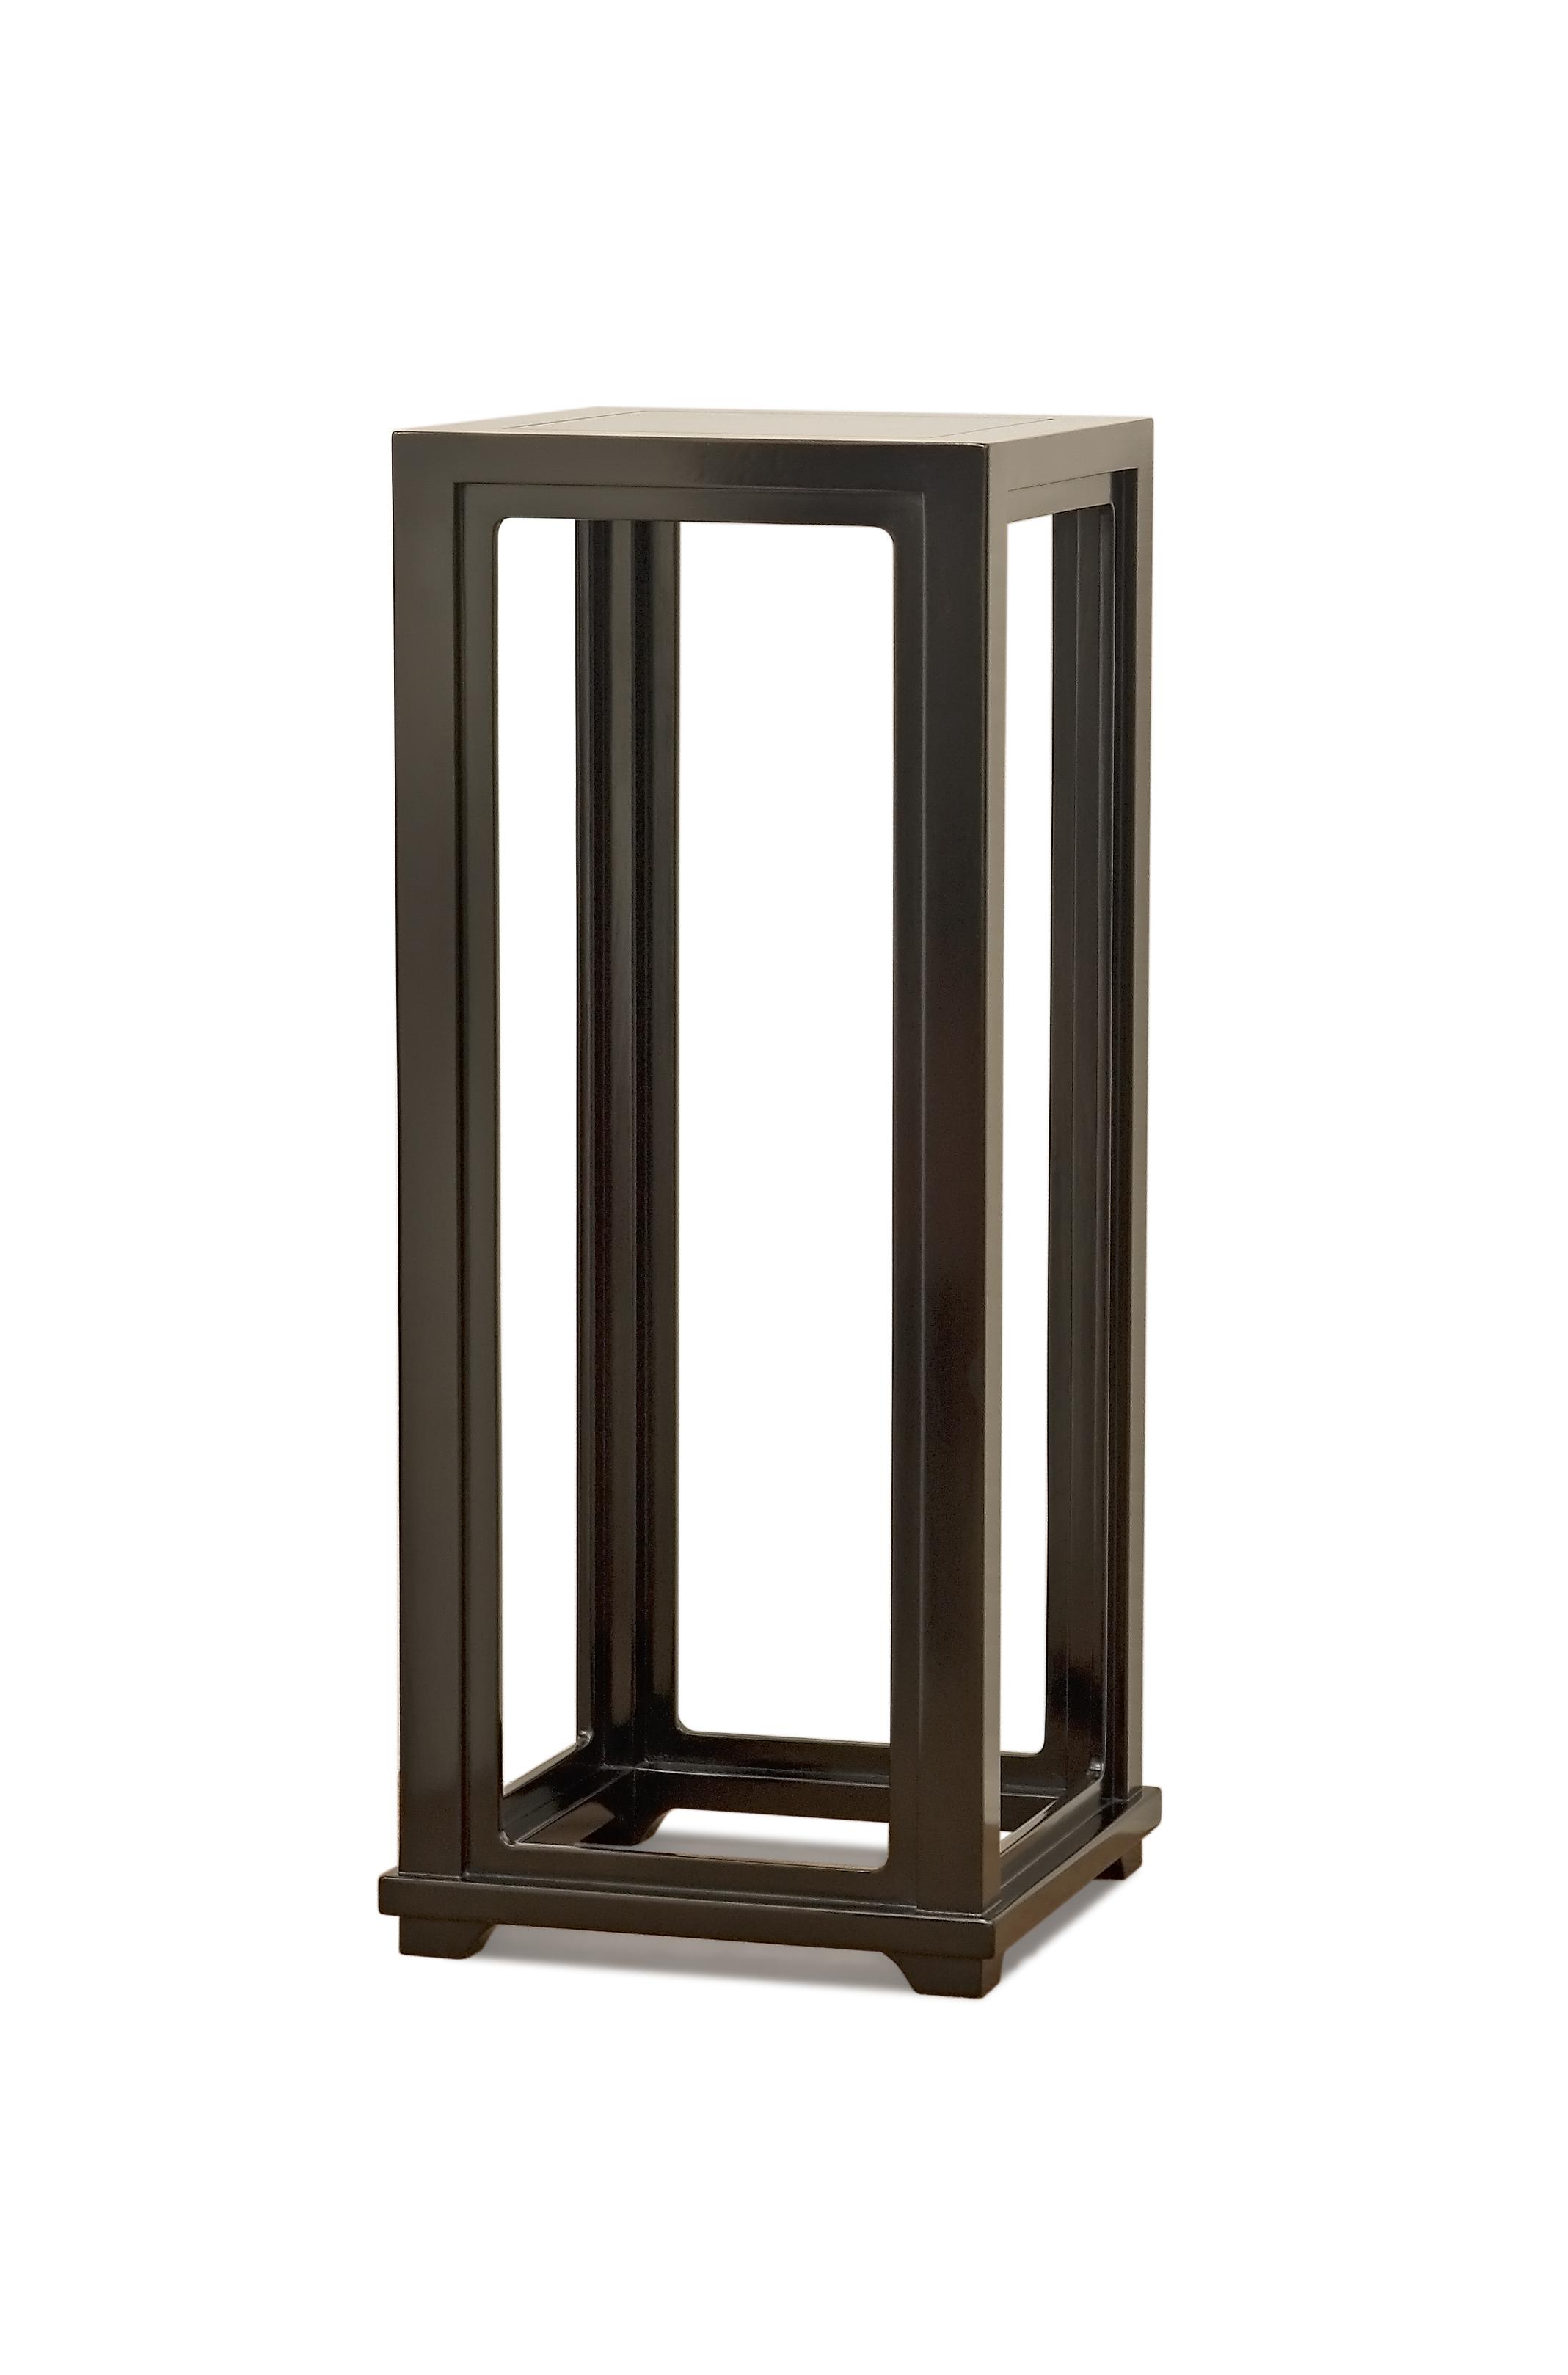 ....chinese ming style furniture : stand..中式明式家具 : 花几....